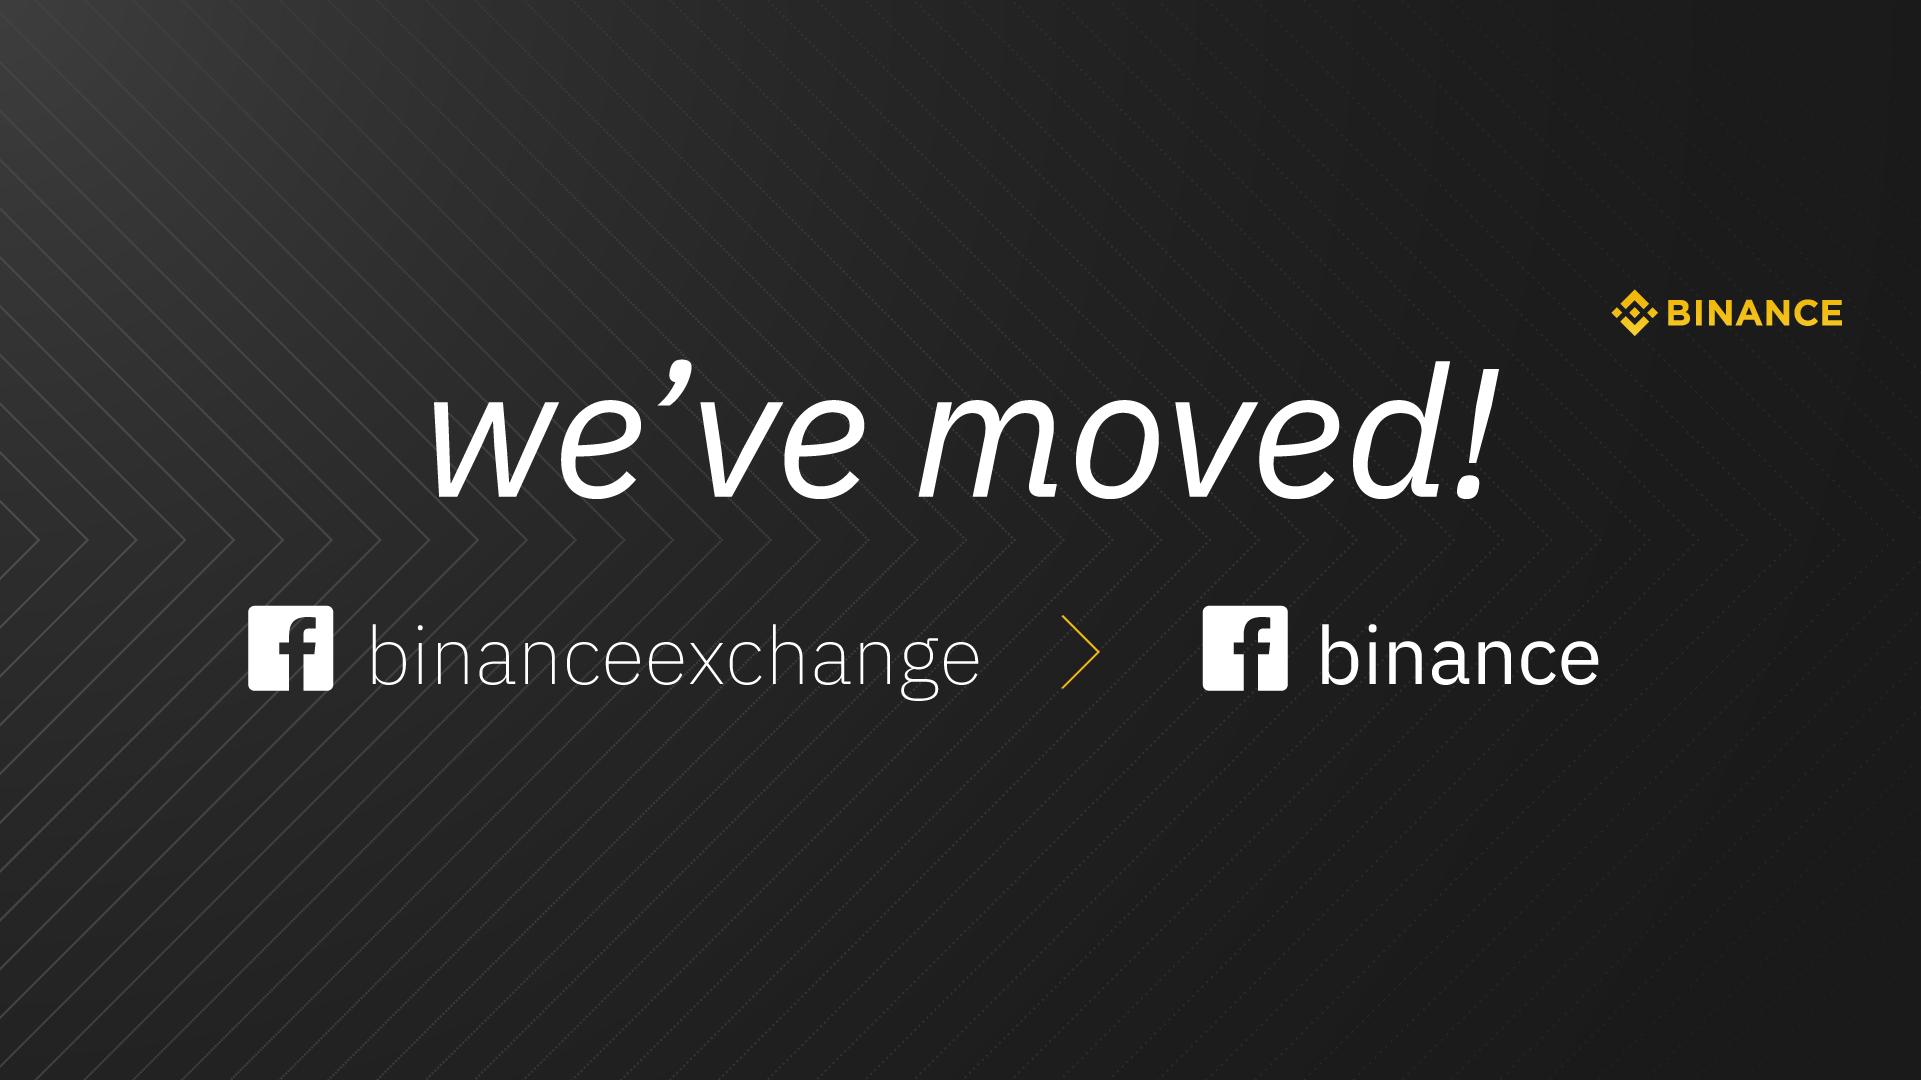 Binance Review, Month 22: We Thank You | Binance Blog